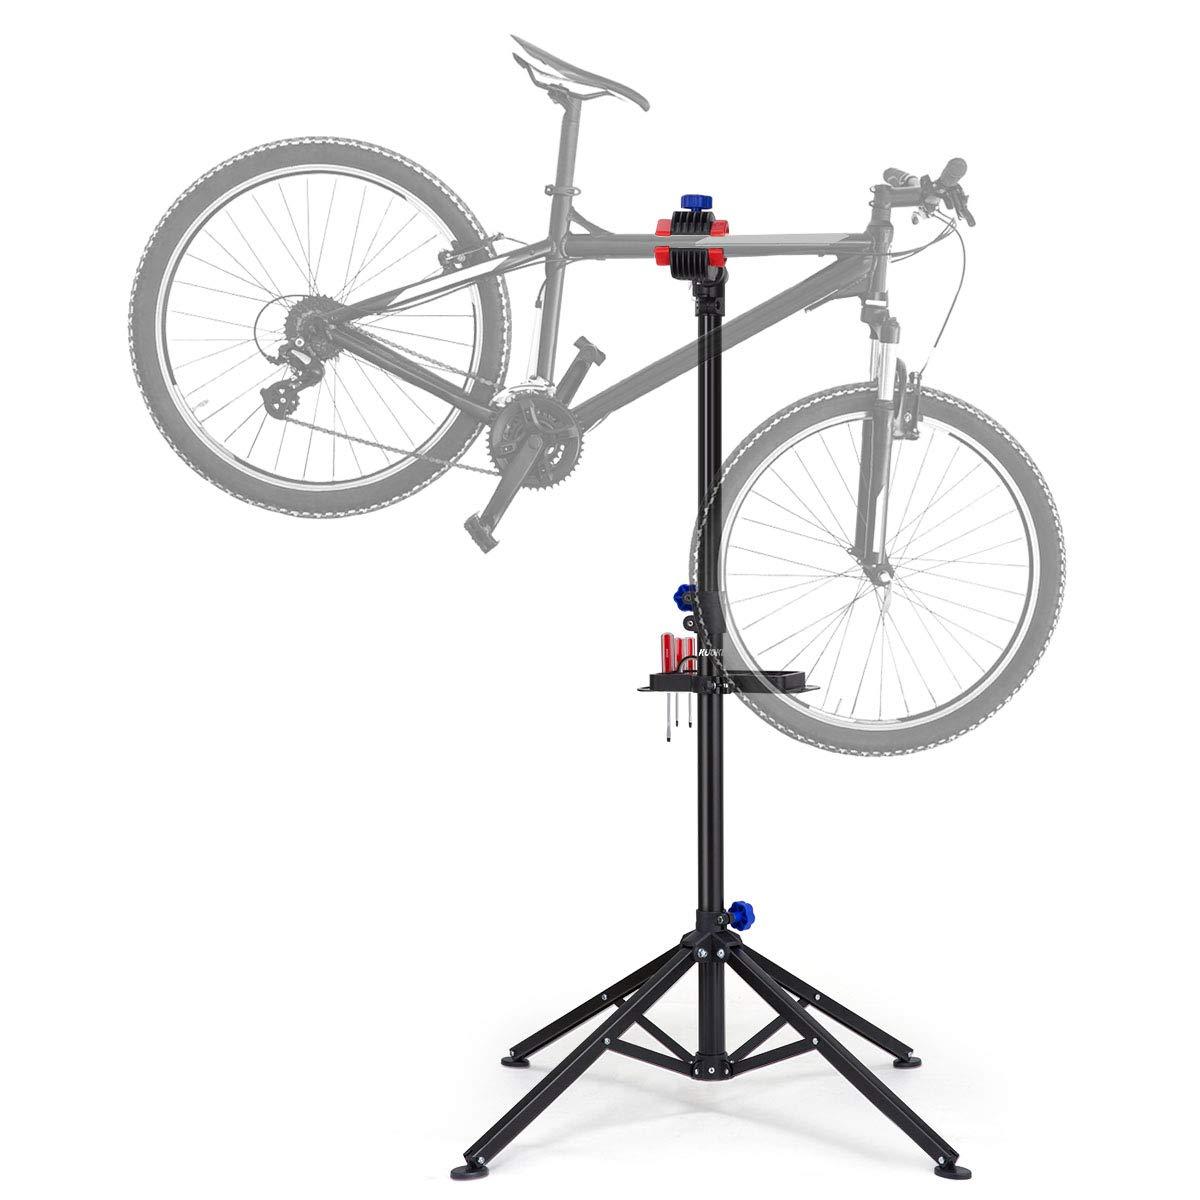 KUOKEL Bike Repair Stand, Foldable Bicycle Repair Rack Workstand, Height Adjustable by KUOKEL